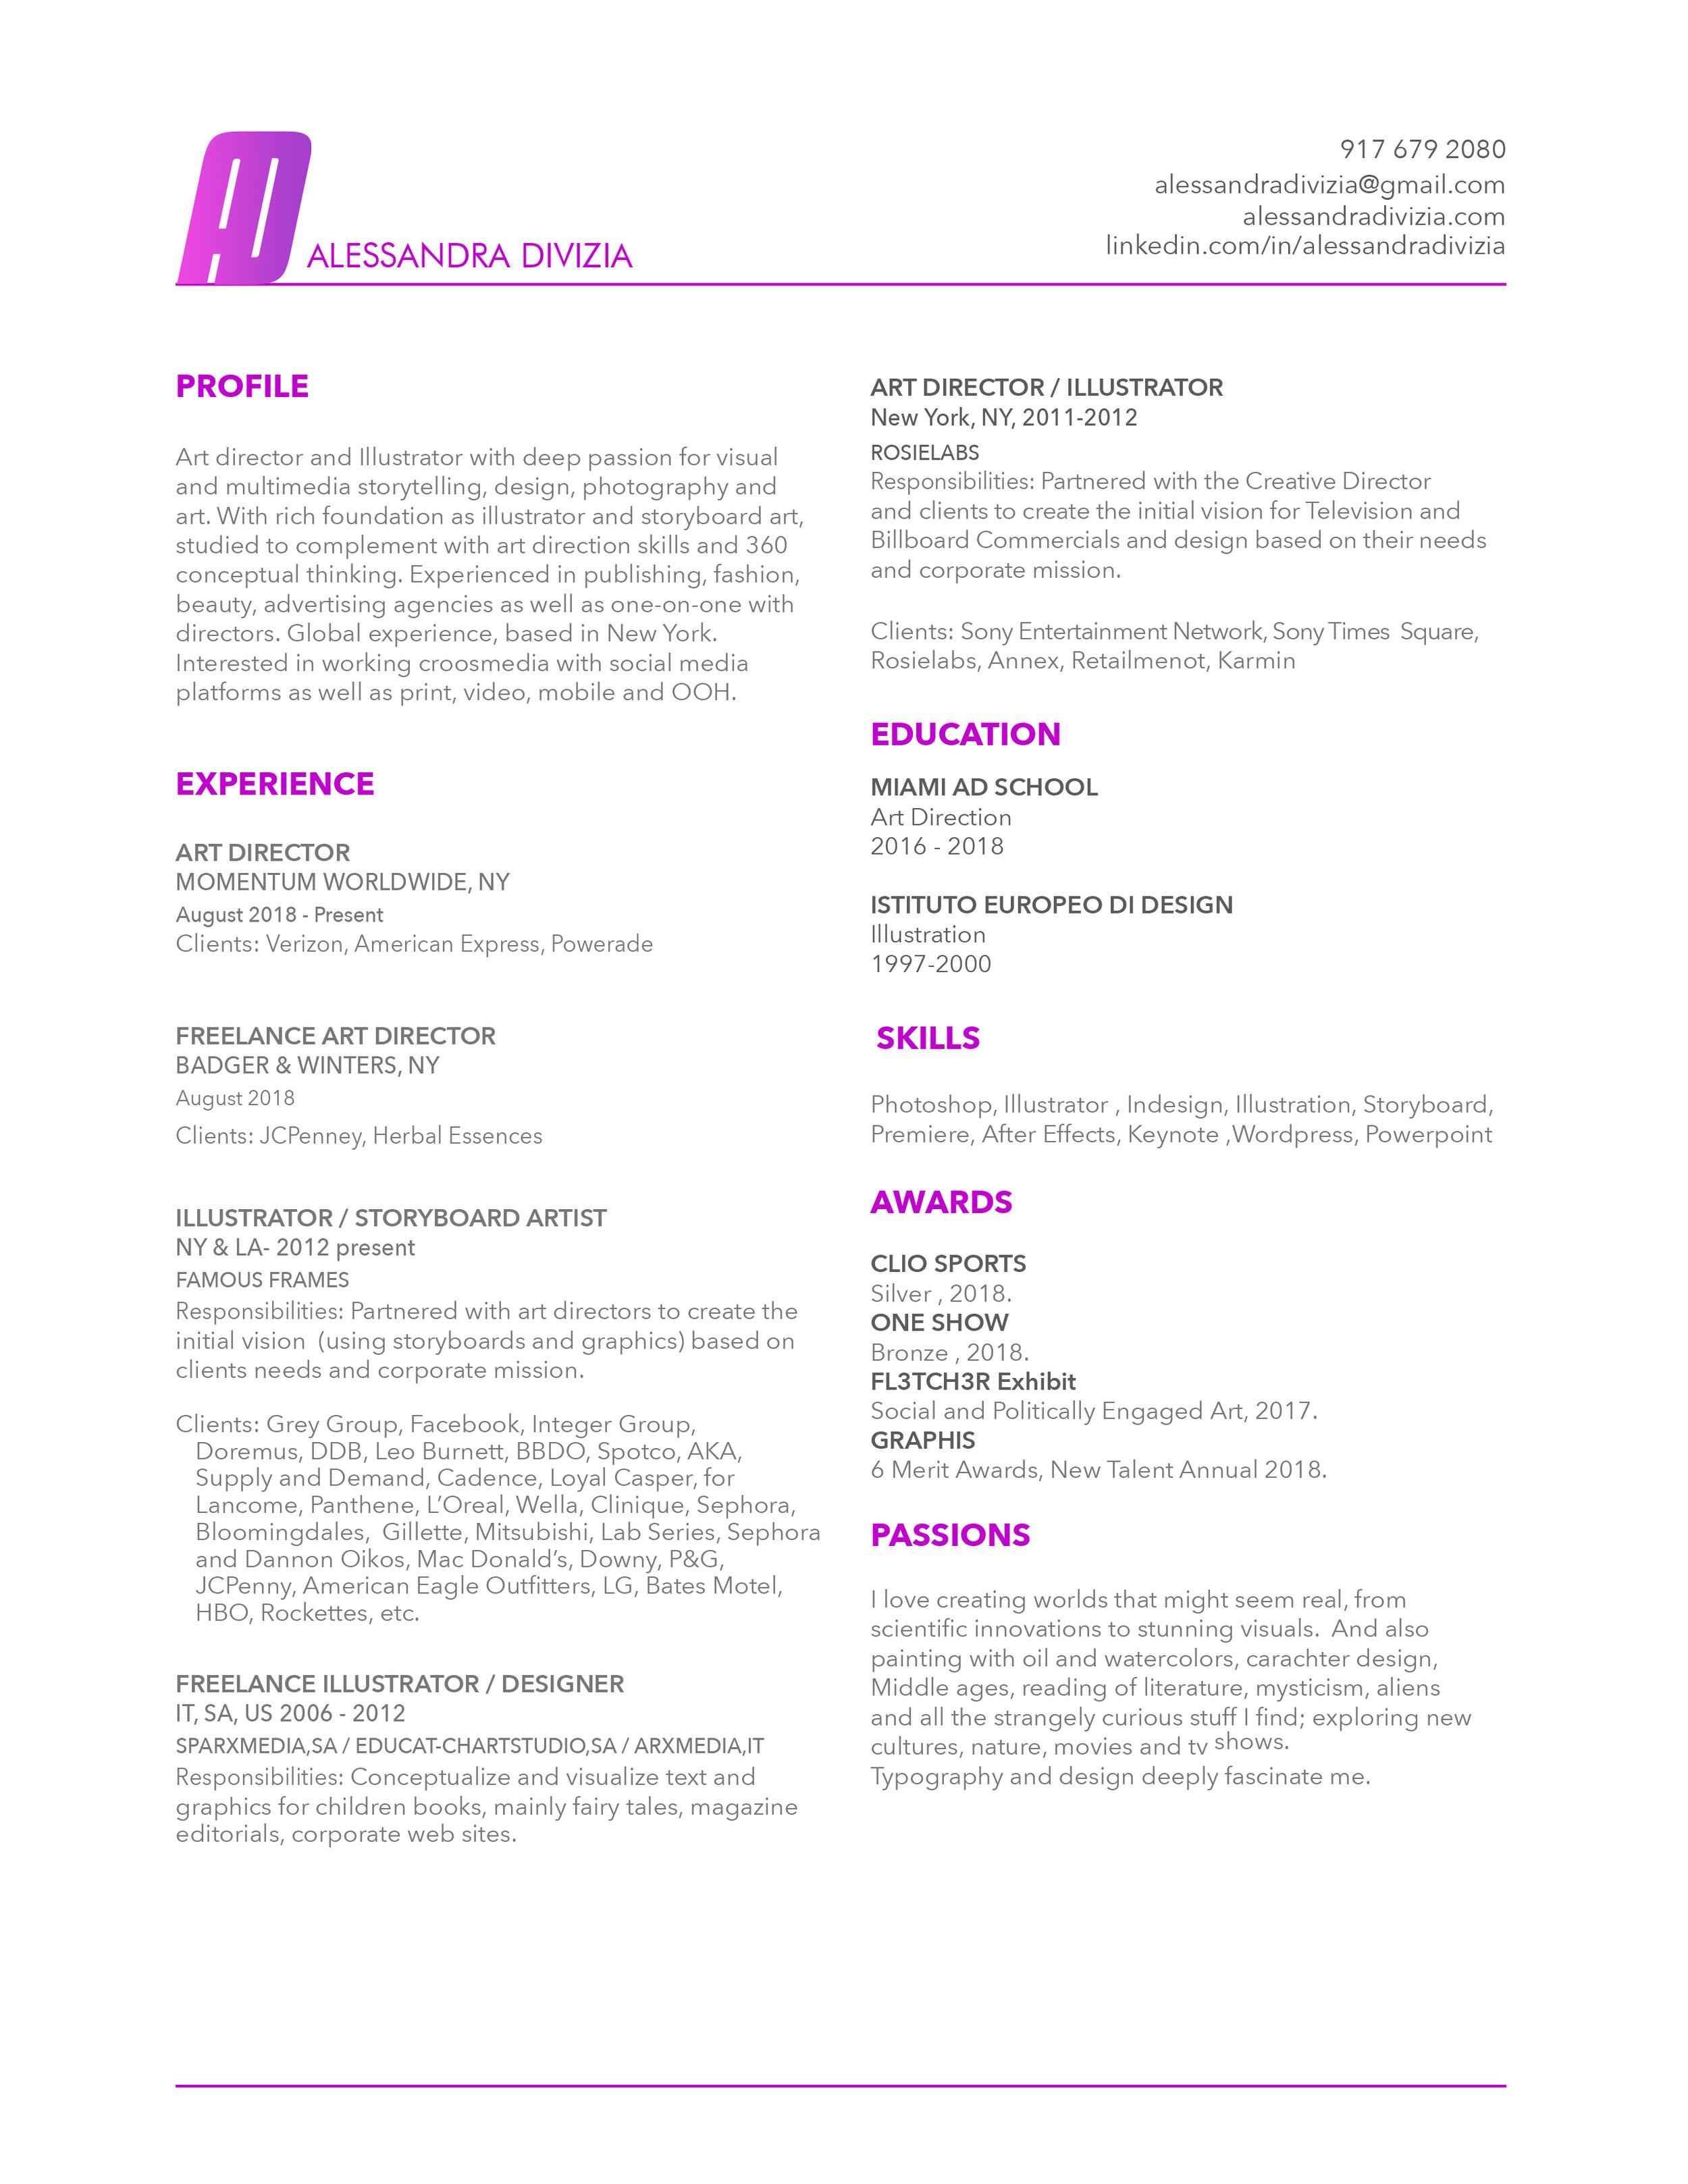 Resume 050119.jpg